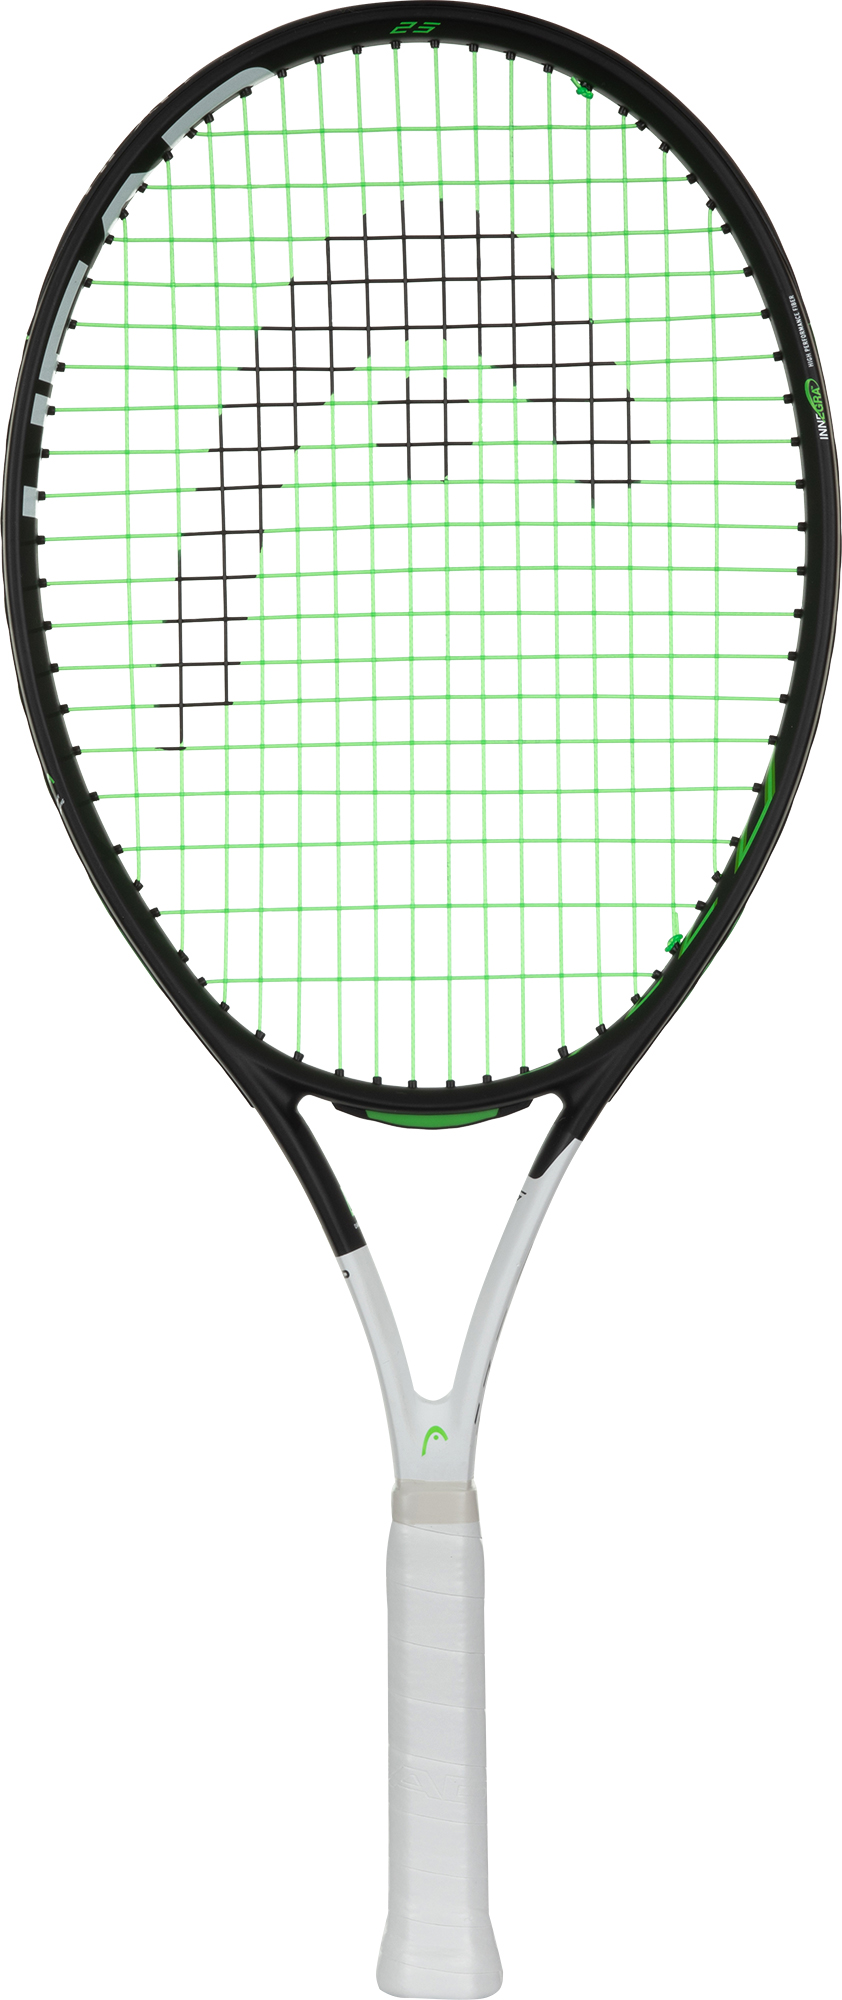 Head Ракетка для большого тенниса детская Head IG Speed 25 head ракетка для большого тенниса head graphene 360 speed lite 27